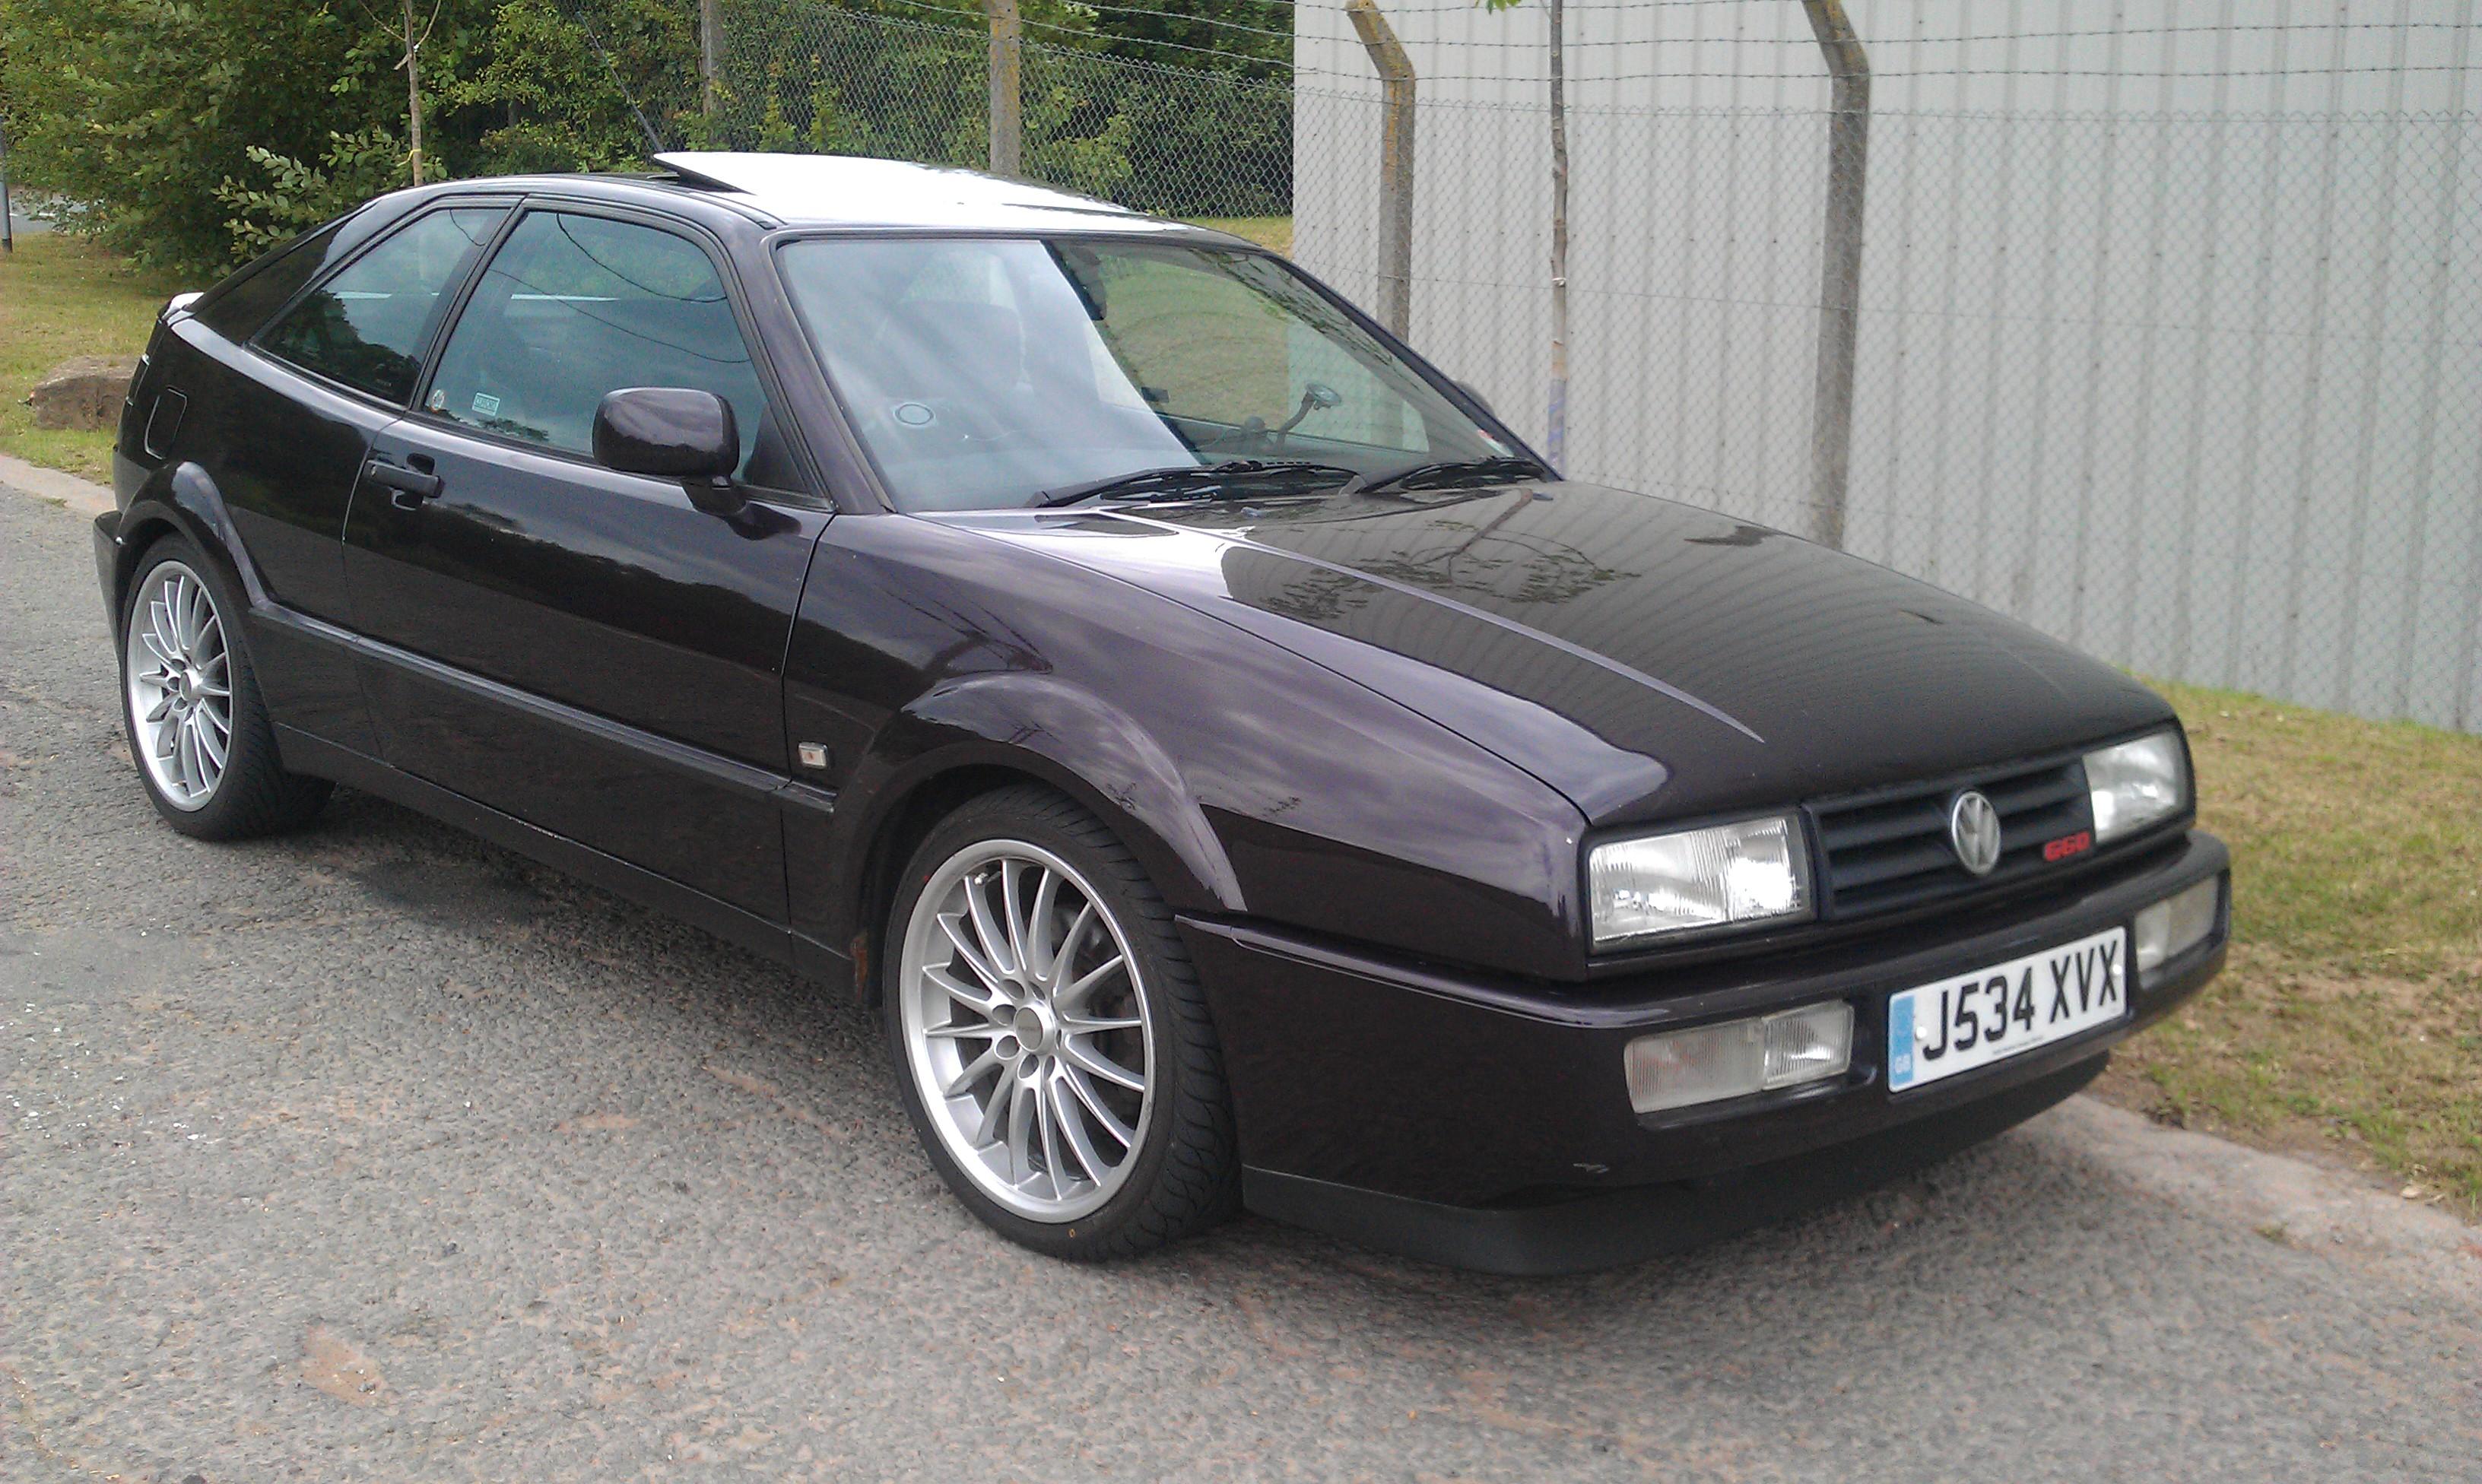 VW Corrado G60 | My new daily driver, sadly I will soon be s… | Flickr - Photo Sharing!